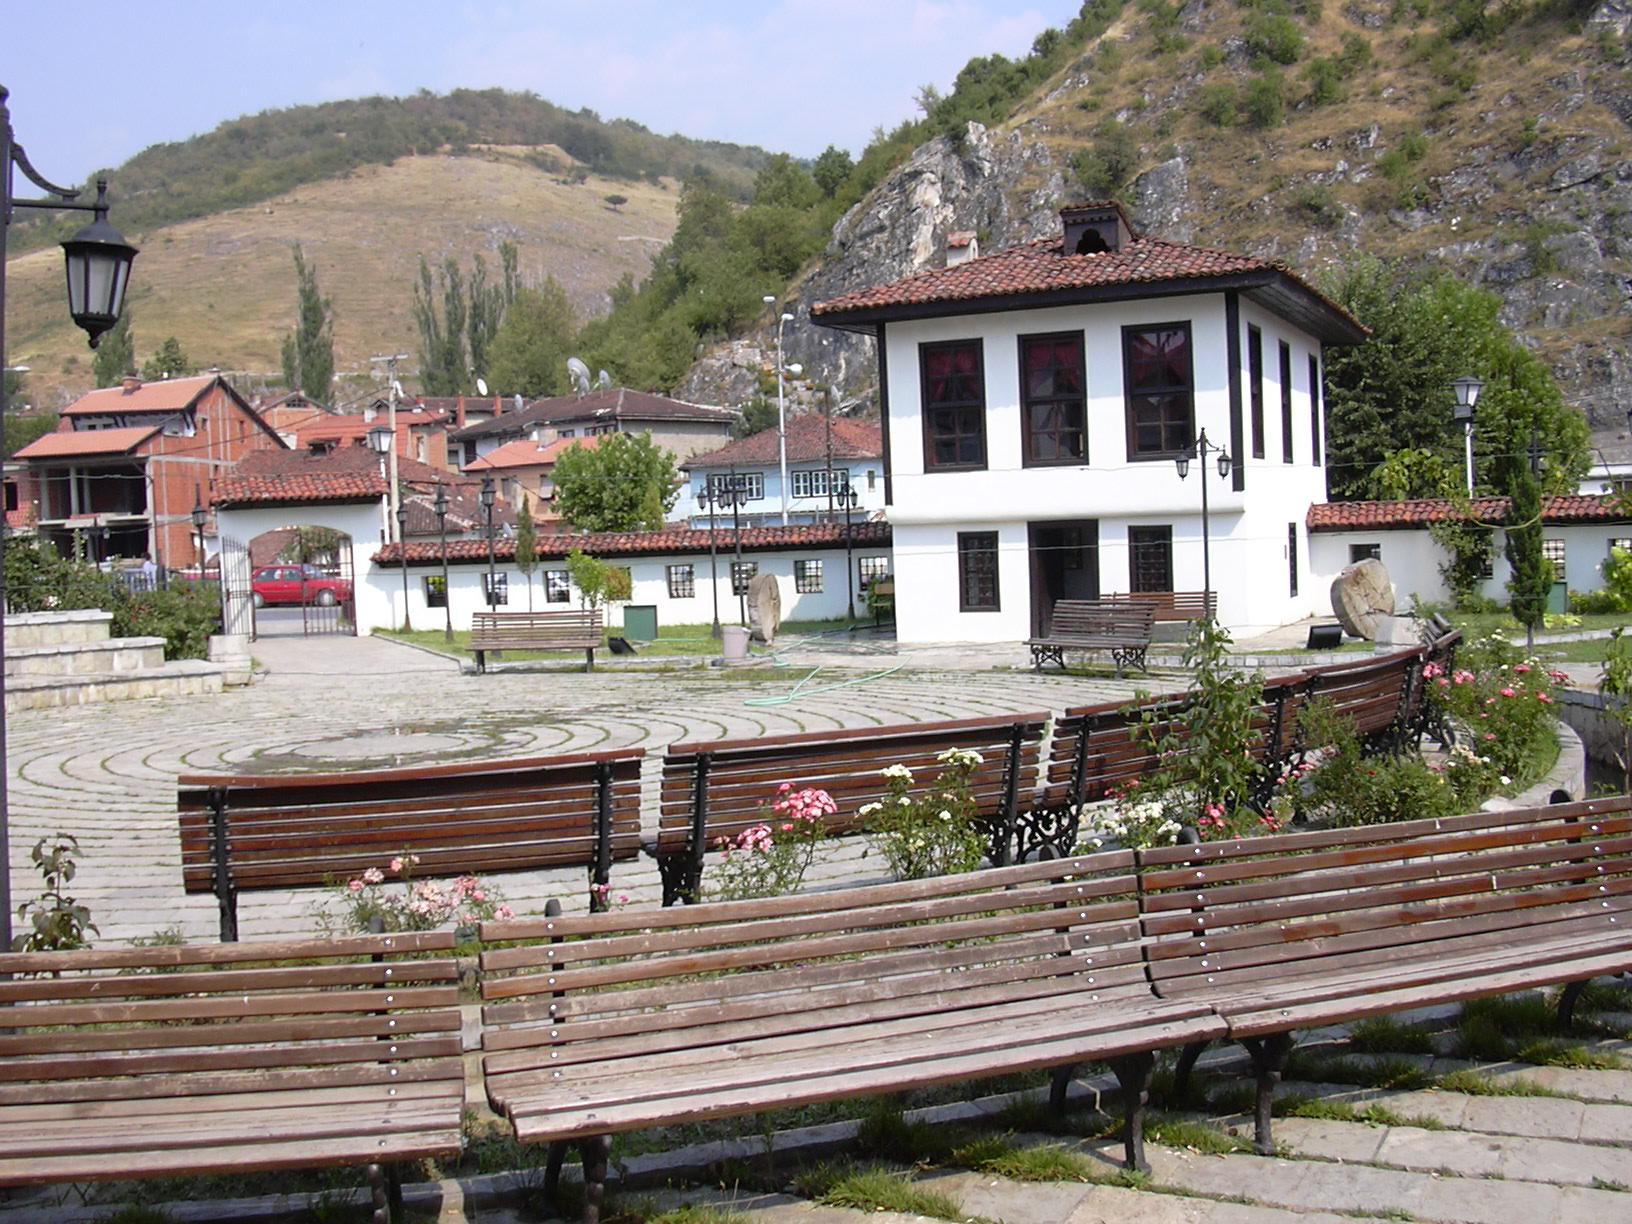 Ndërtesa ku u mbajt Lidhja Shqiptare e Prizrenit,Prizren